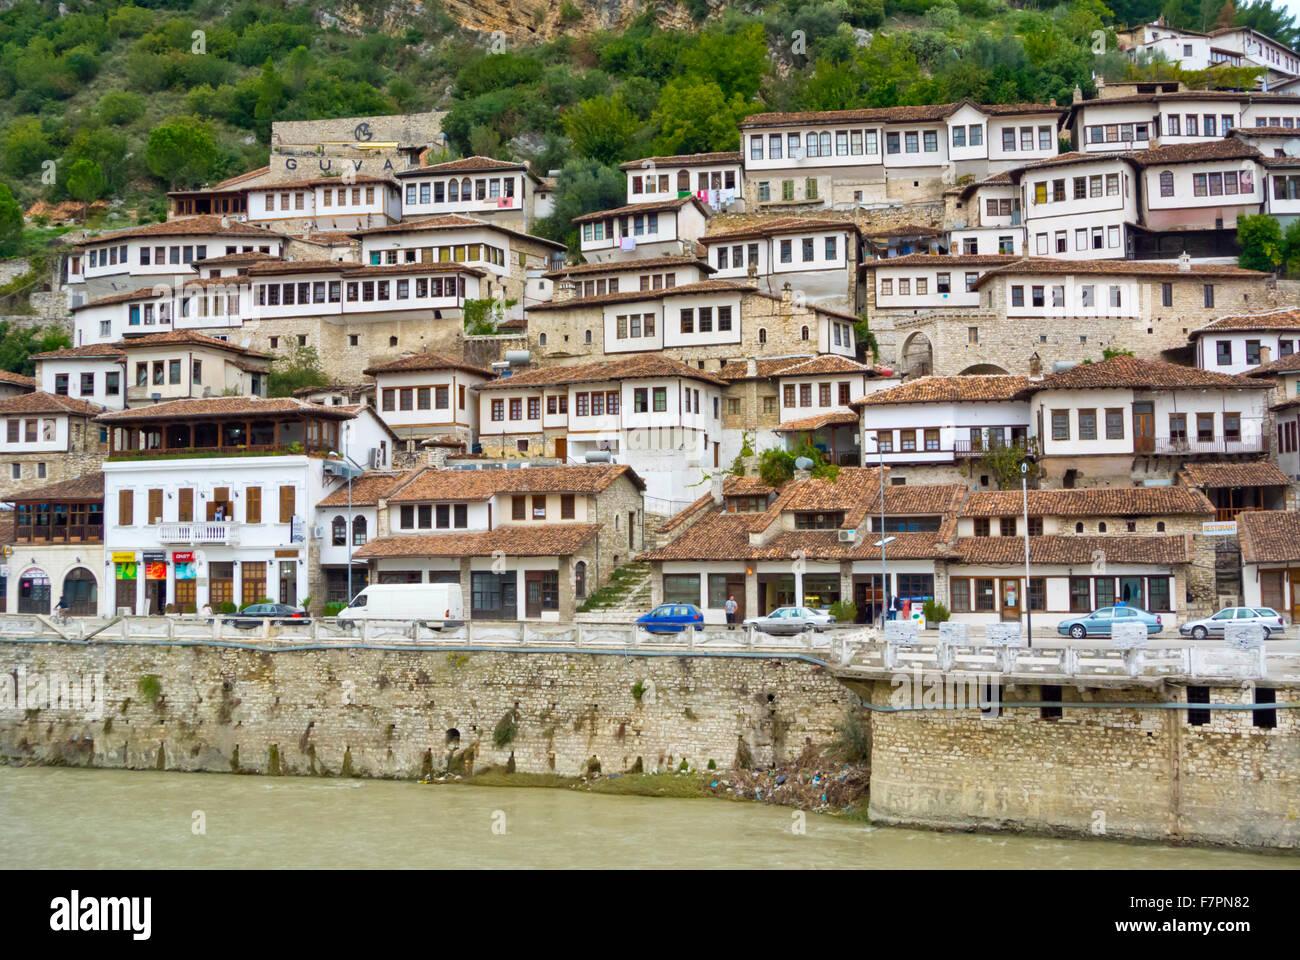 Hillside houses,from Ottoman period, riverside Osum, Berat, Albania - Stock Image